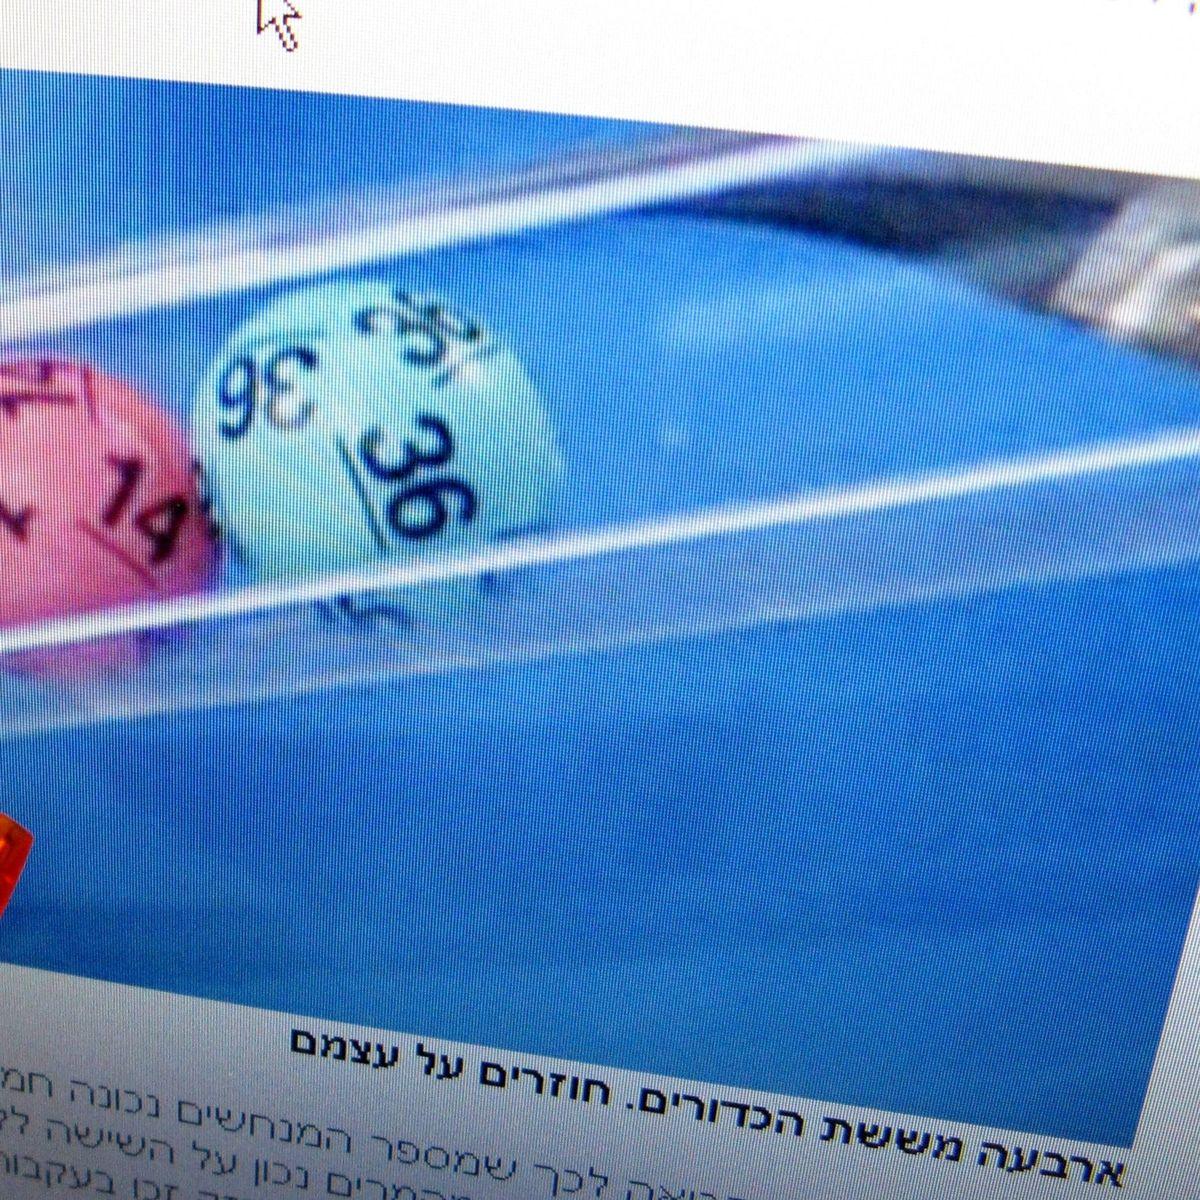 zufalls lottozahlen